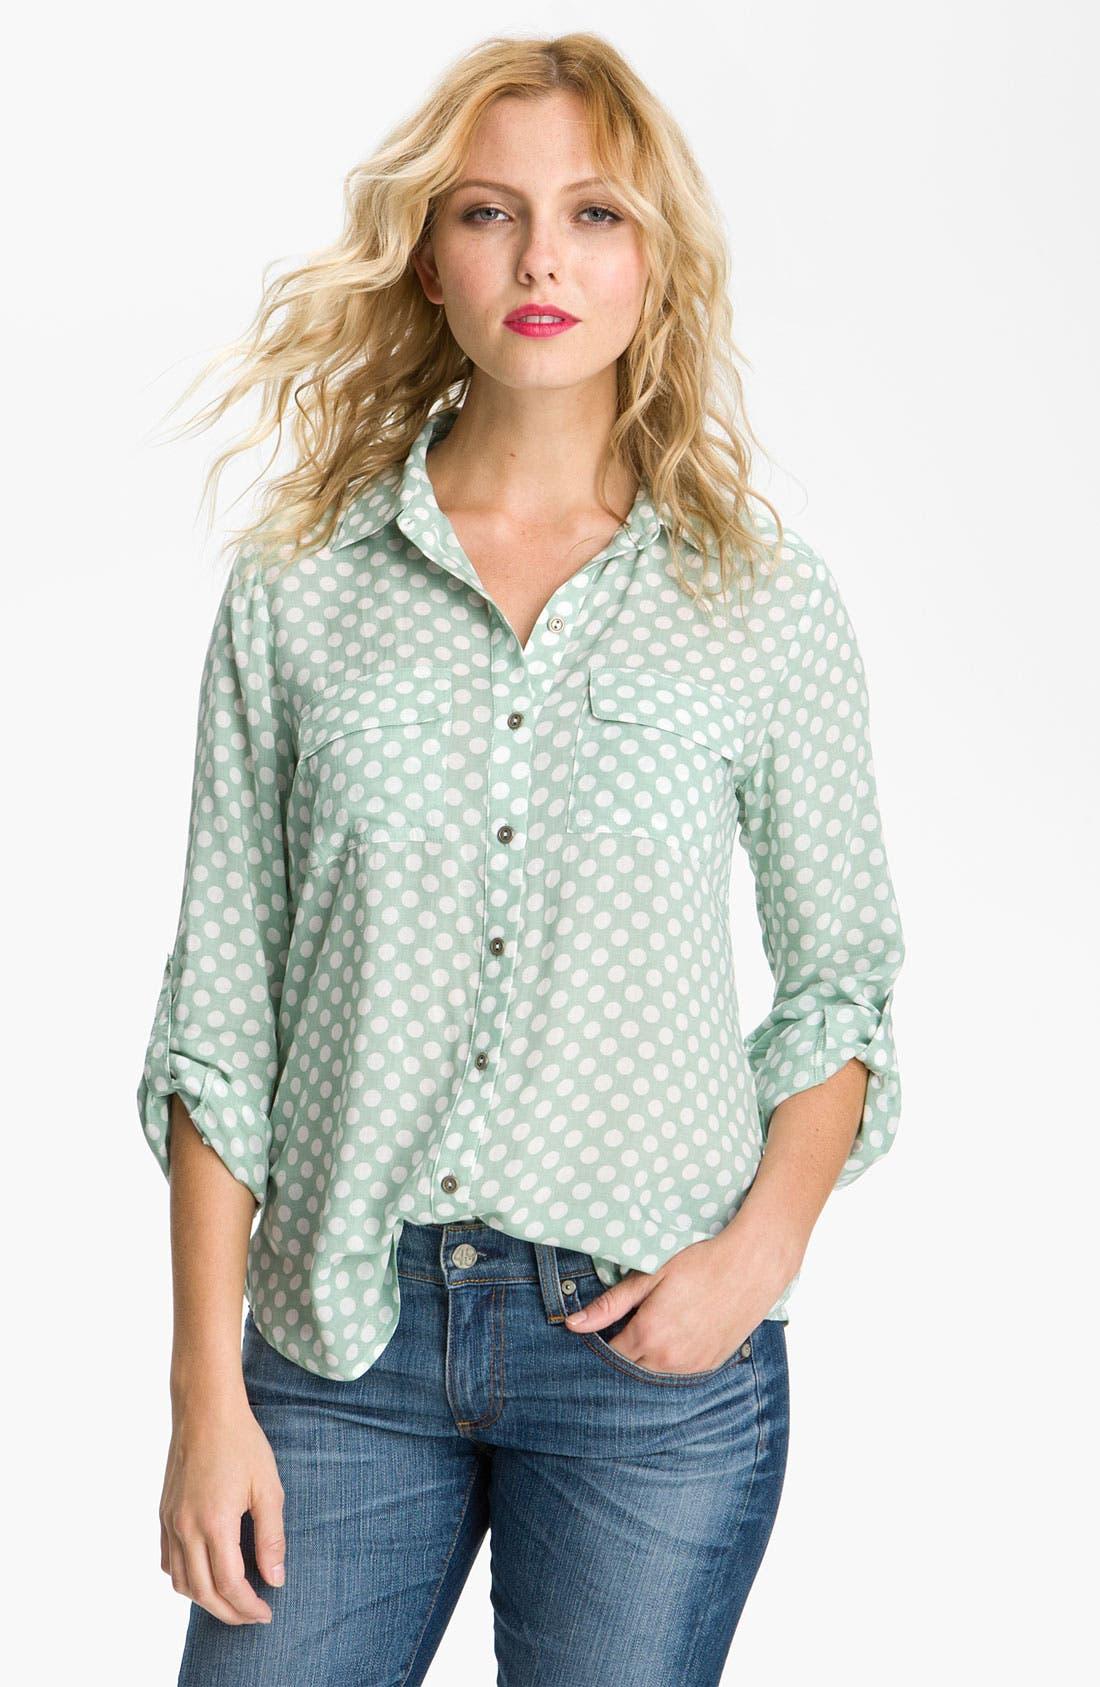 Alternate Image 1 Selected - Gibson Polka Dot Pocket Shirt